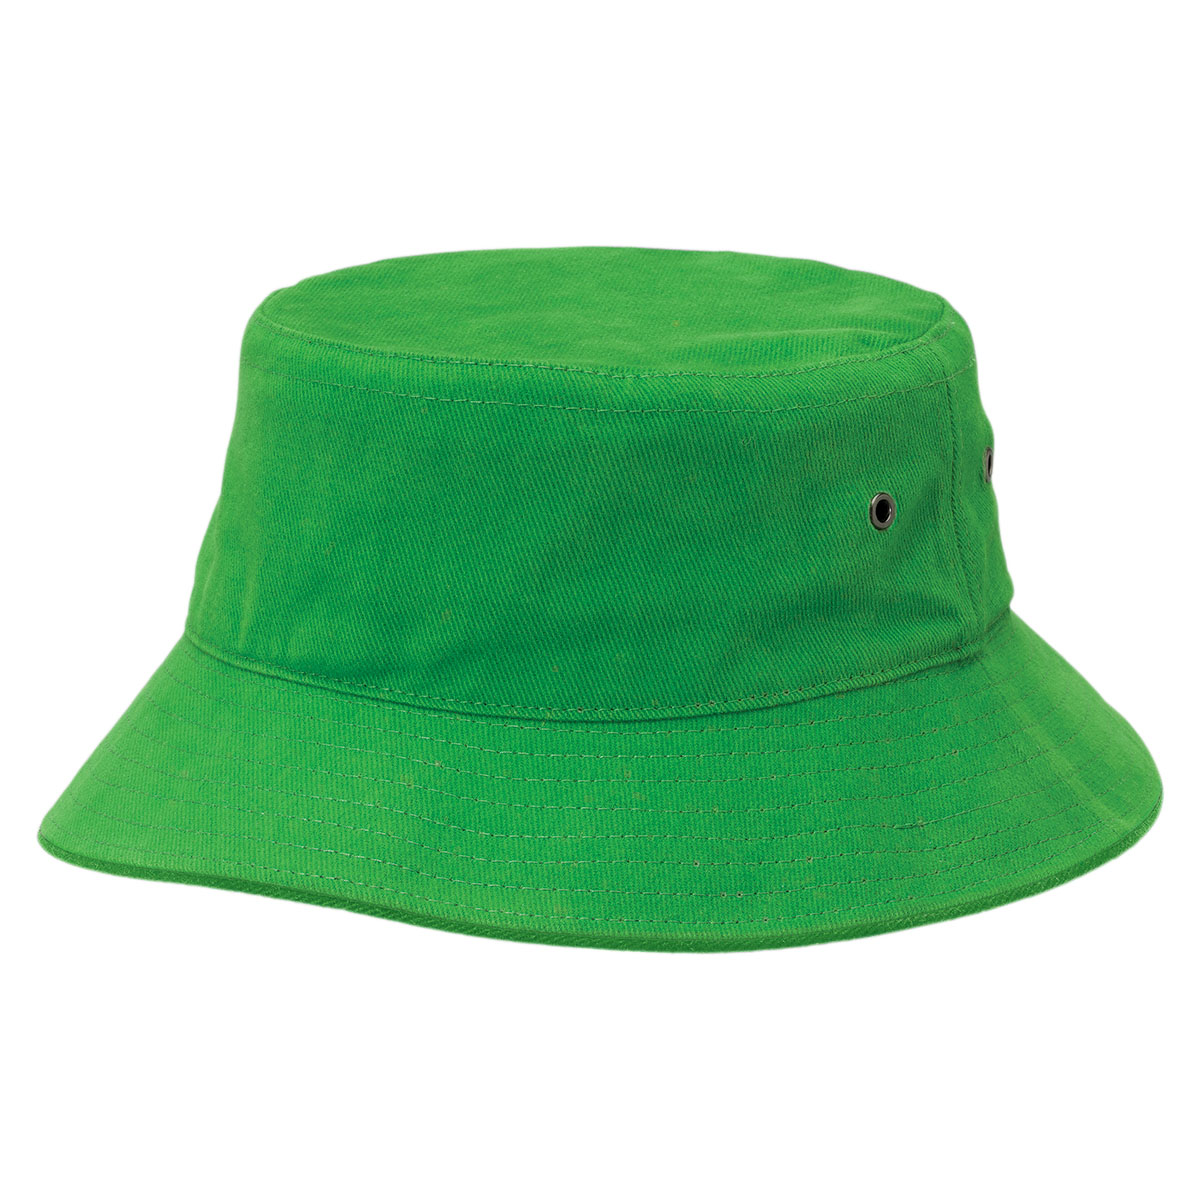 ef086e792 Promotional Sandwich Brim Bucket Hats: Branded Online   Promotion ...